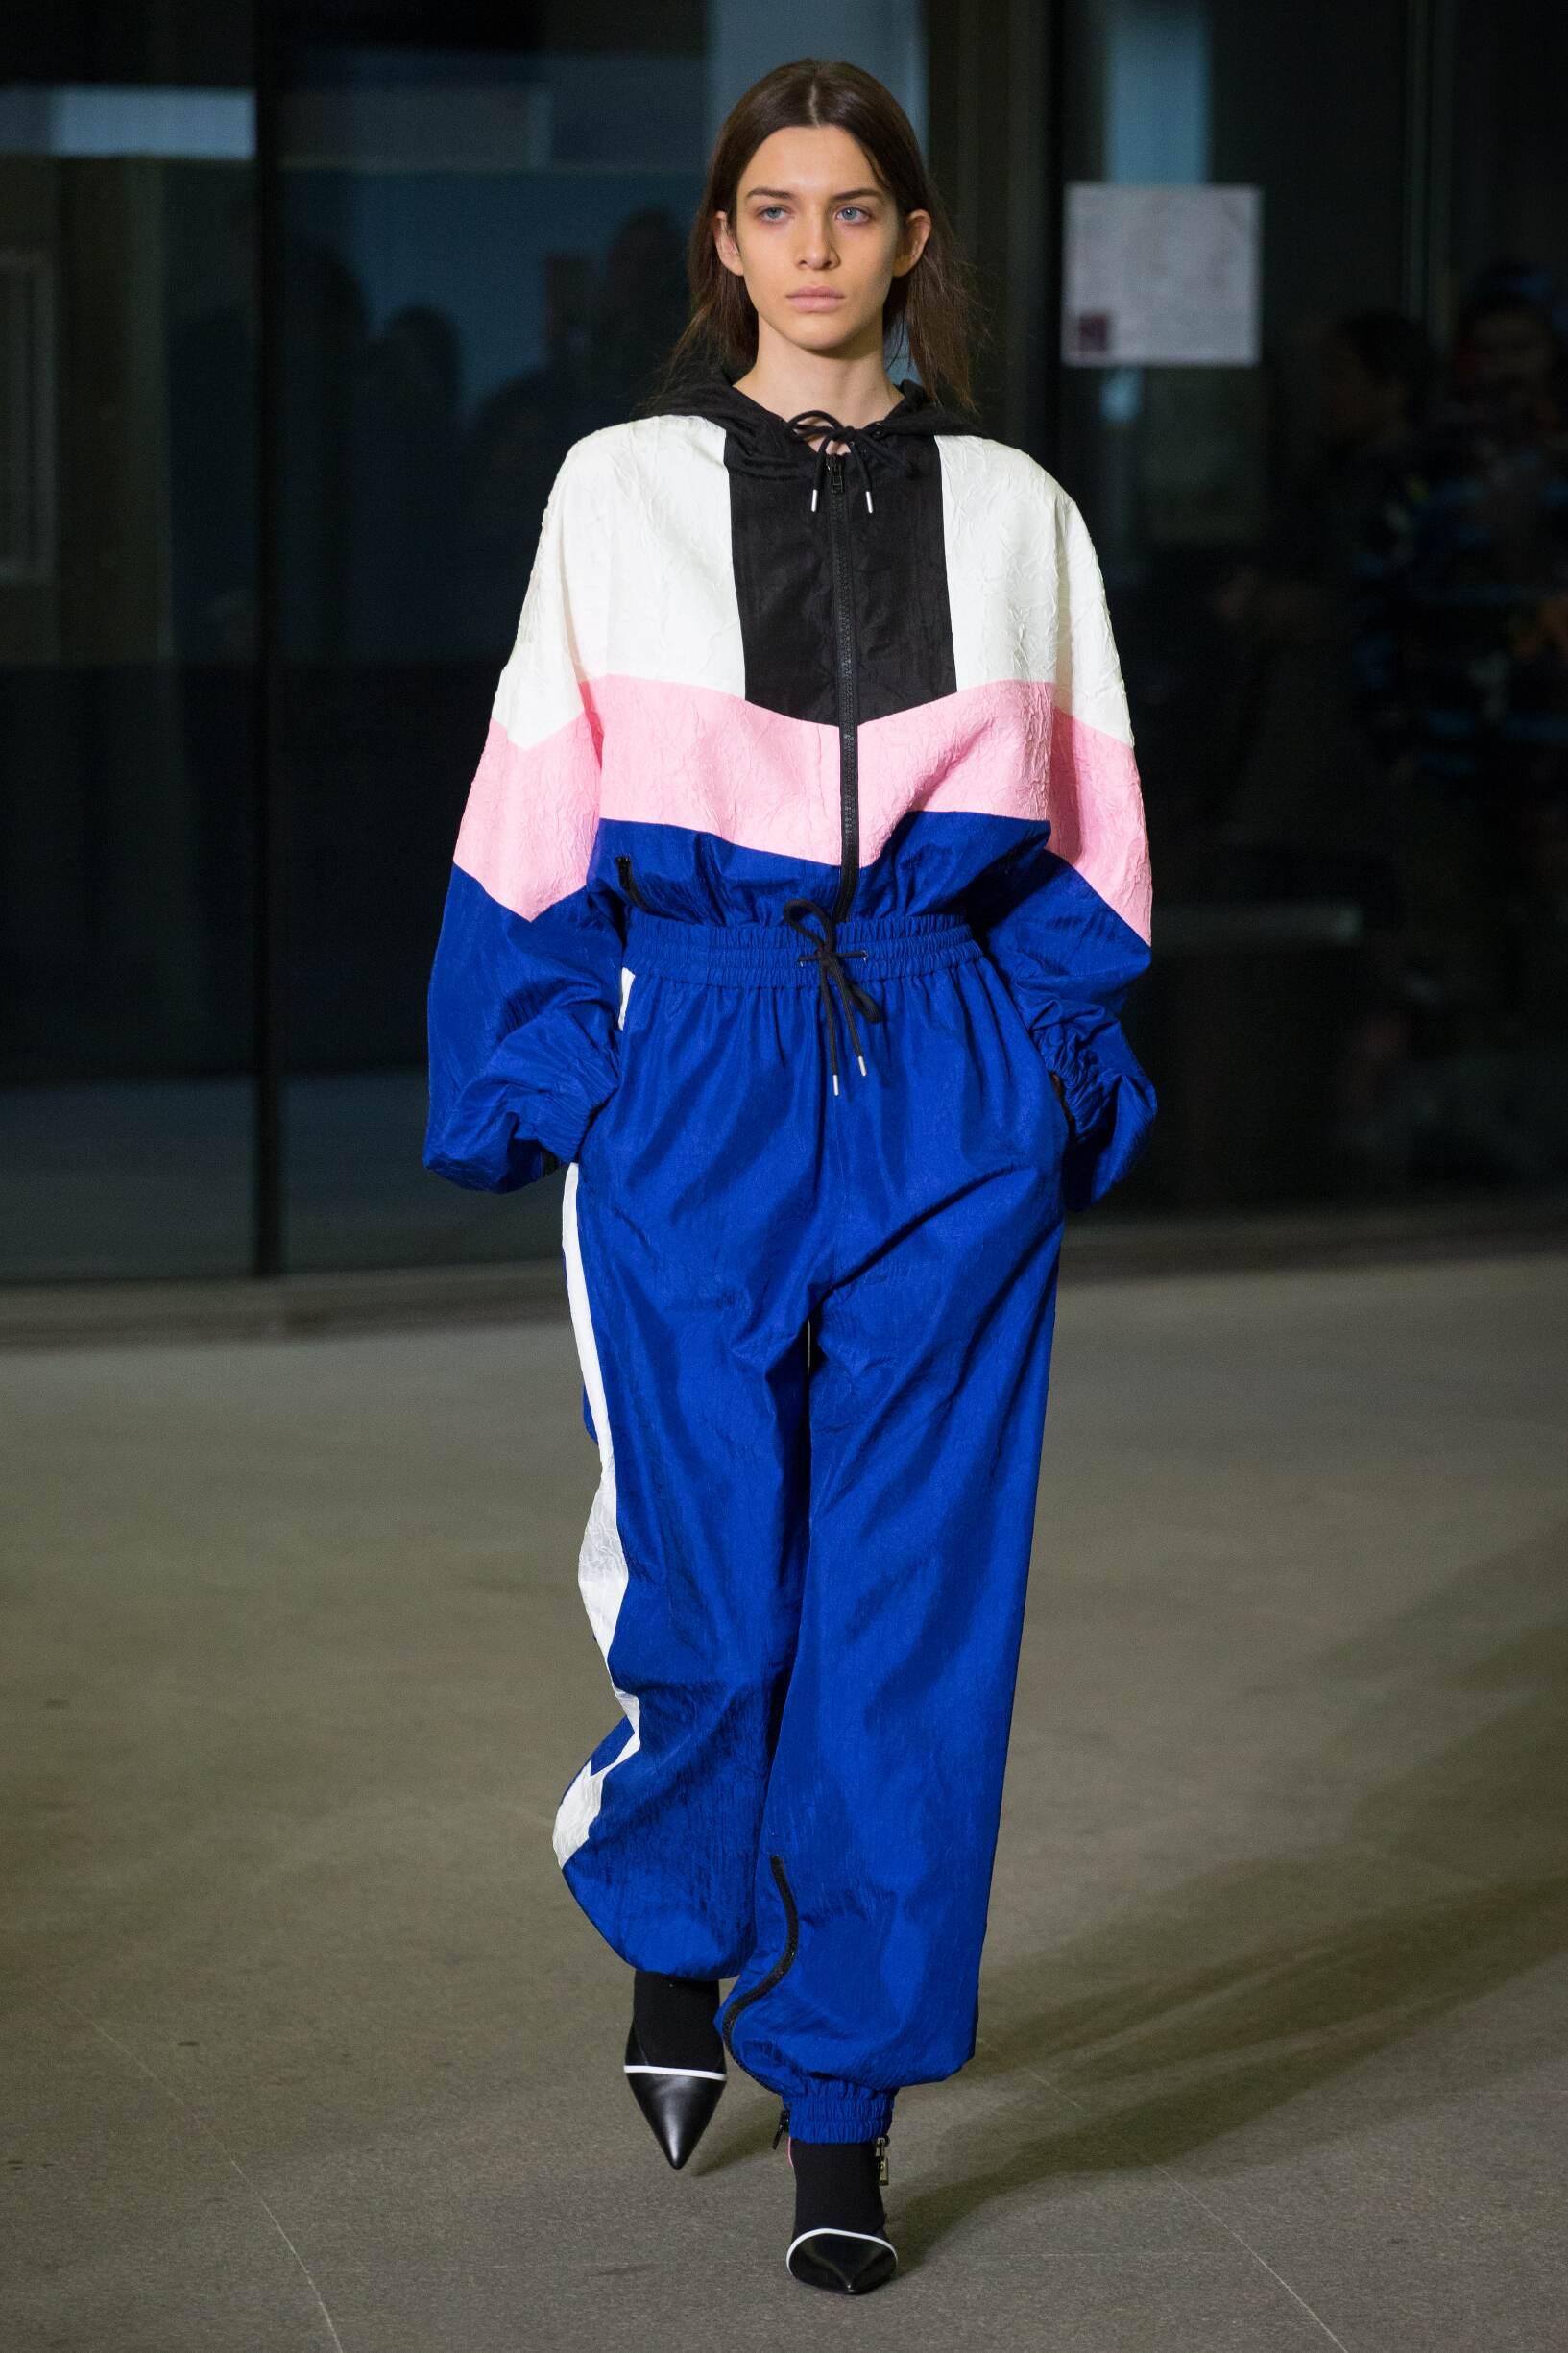 Msgm FW 2018 Womenswear